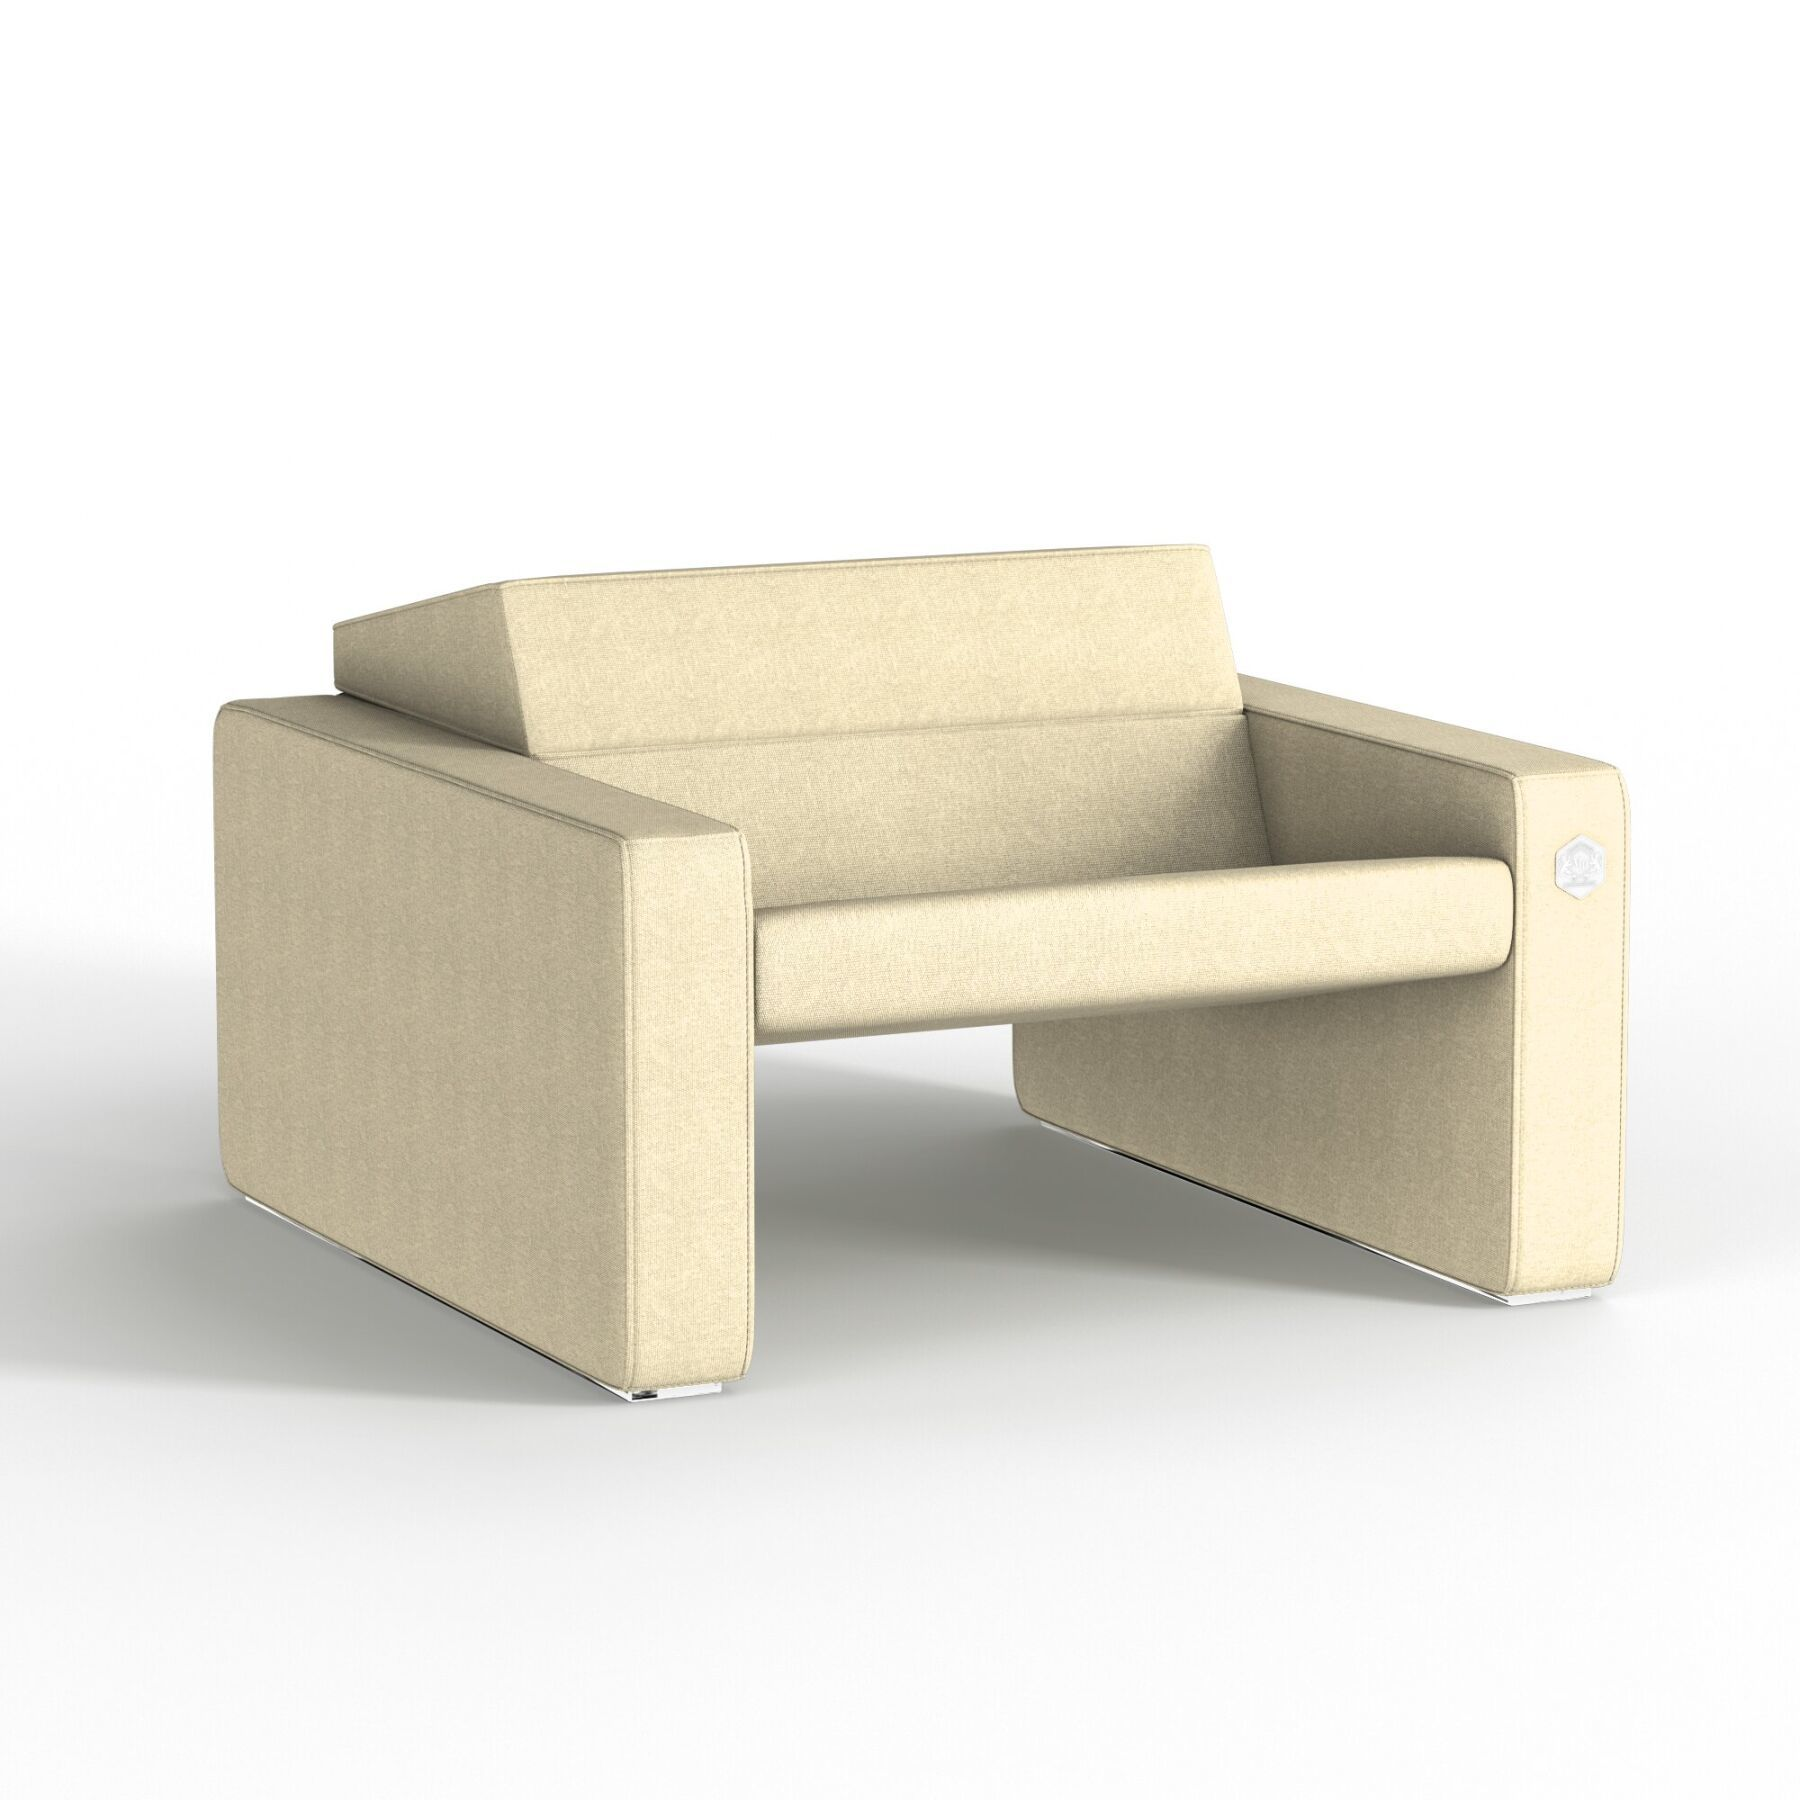 Мягкое кресло KULIK SYSTEM SMART Ткань 1